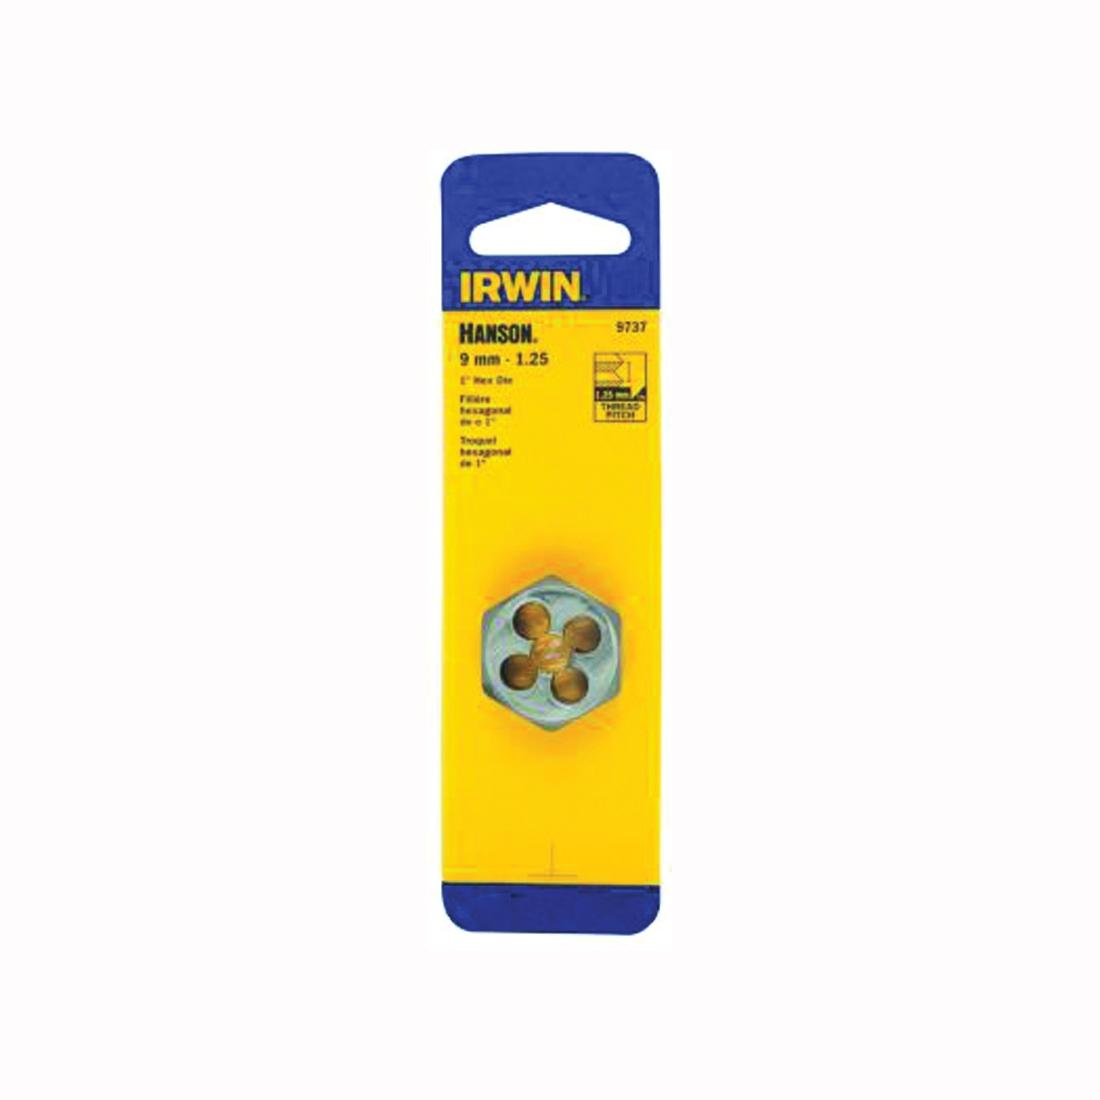 Picture of IRWIN 9737 Metric Dies, M9-1.25 Thread, Right Hand Thread, HCS